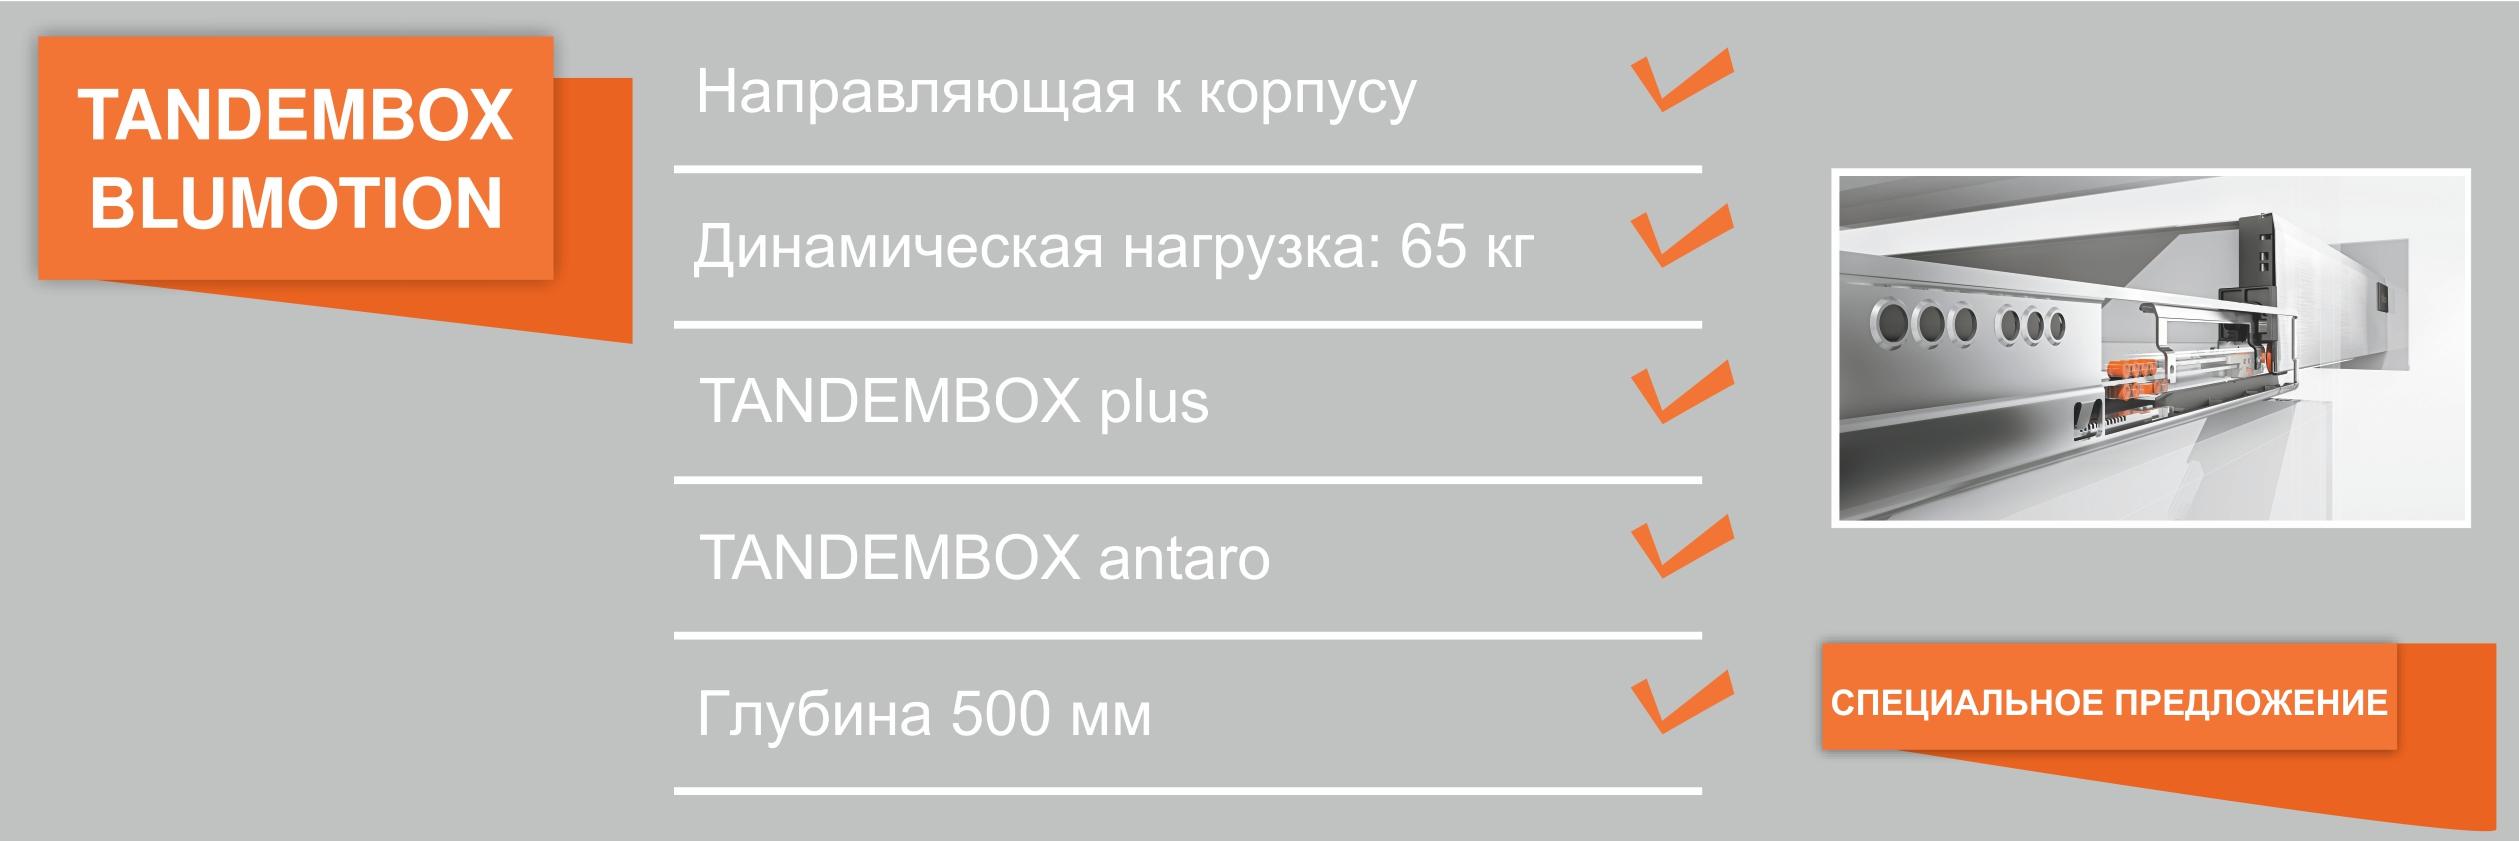 napravljajushhie-tandembox-furnix